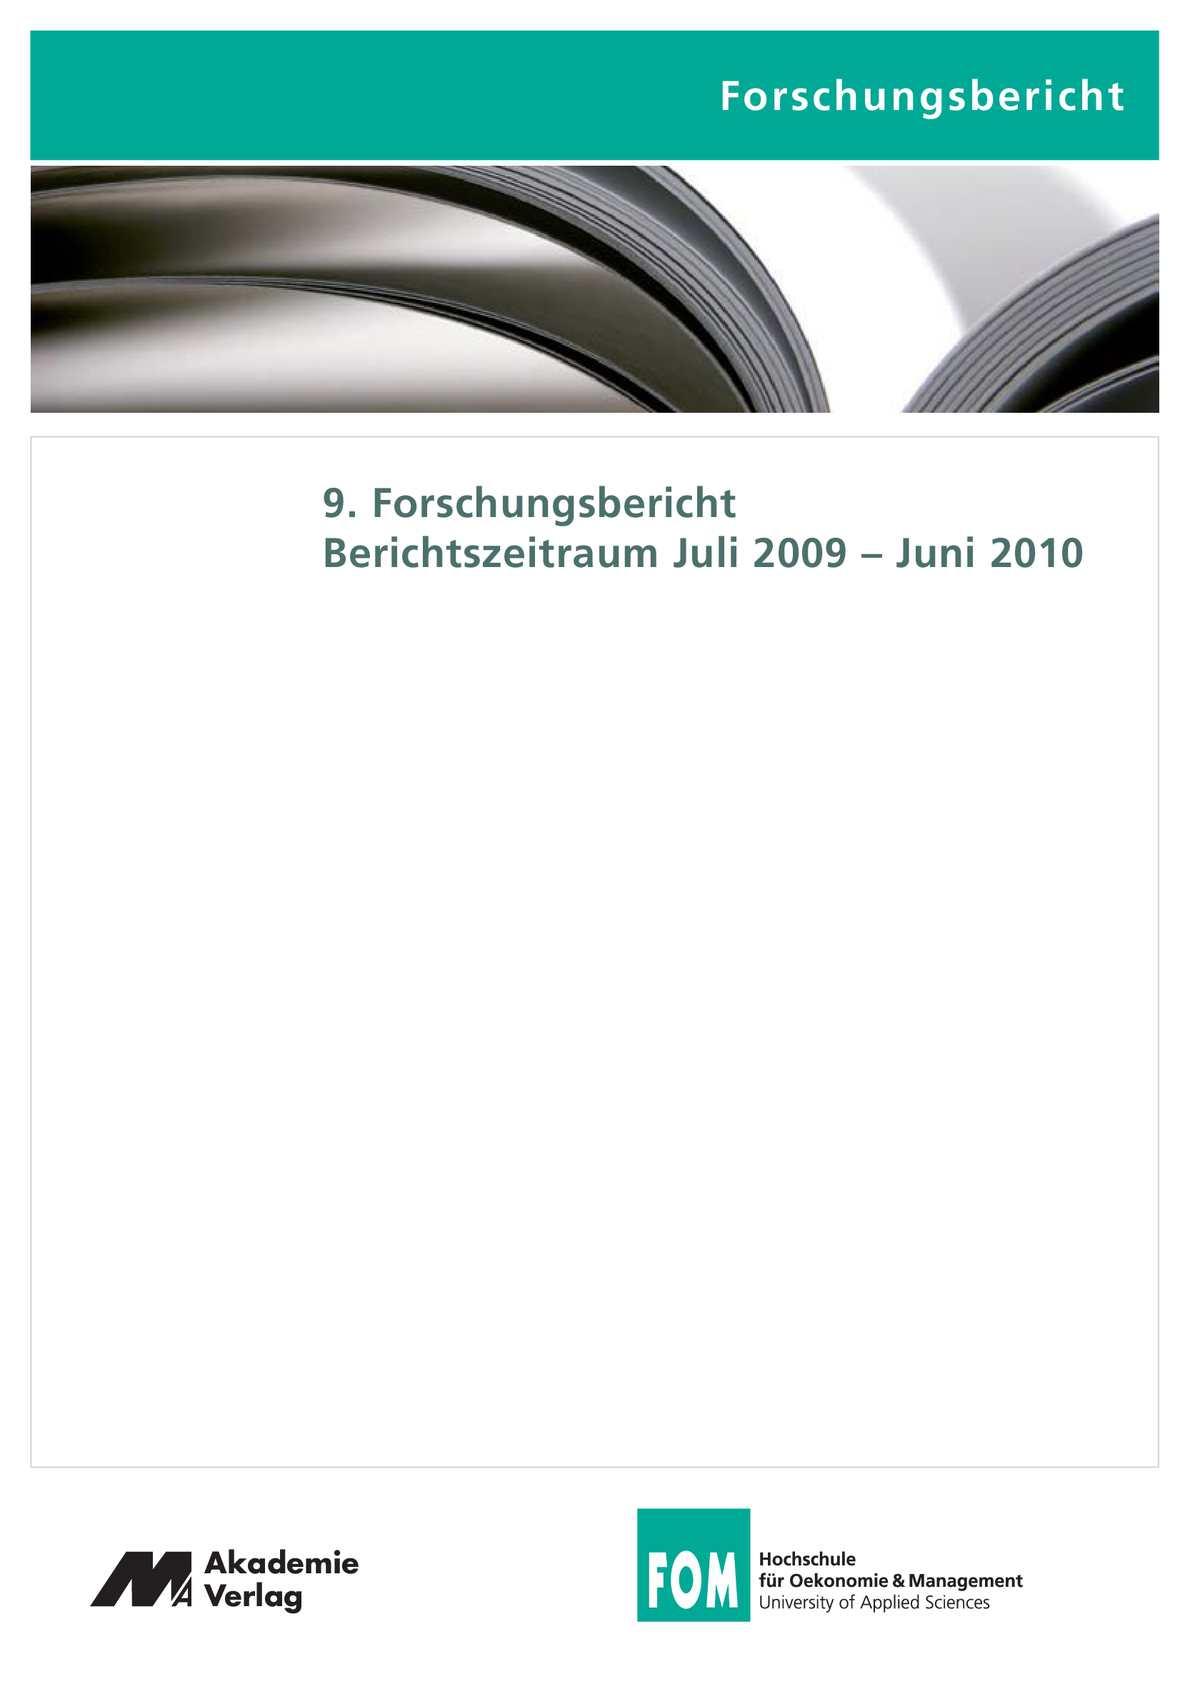 Calaméo - International Turnaround Management Standard in FOM Research  Report